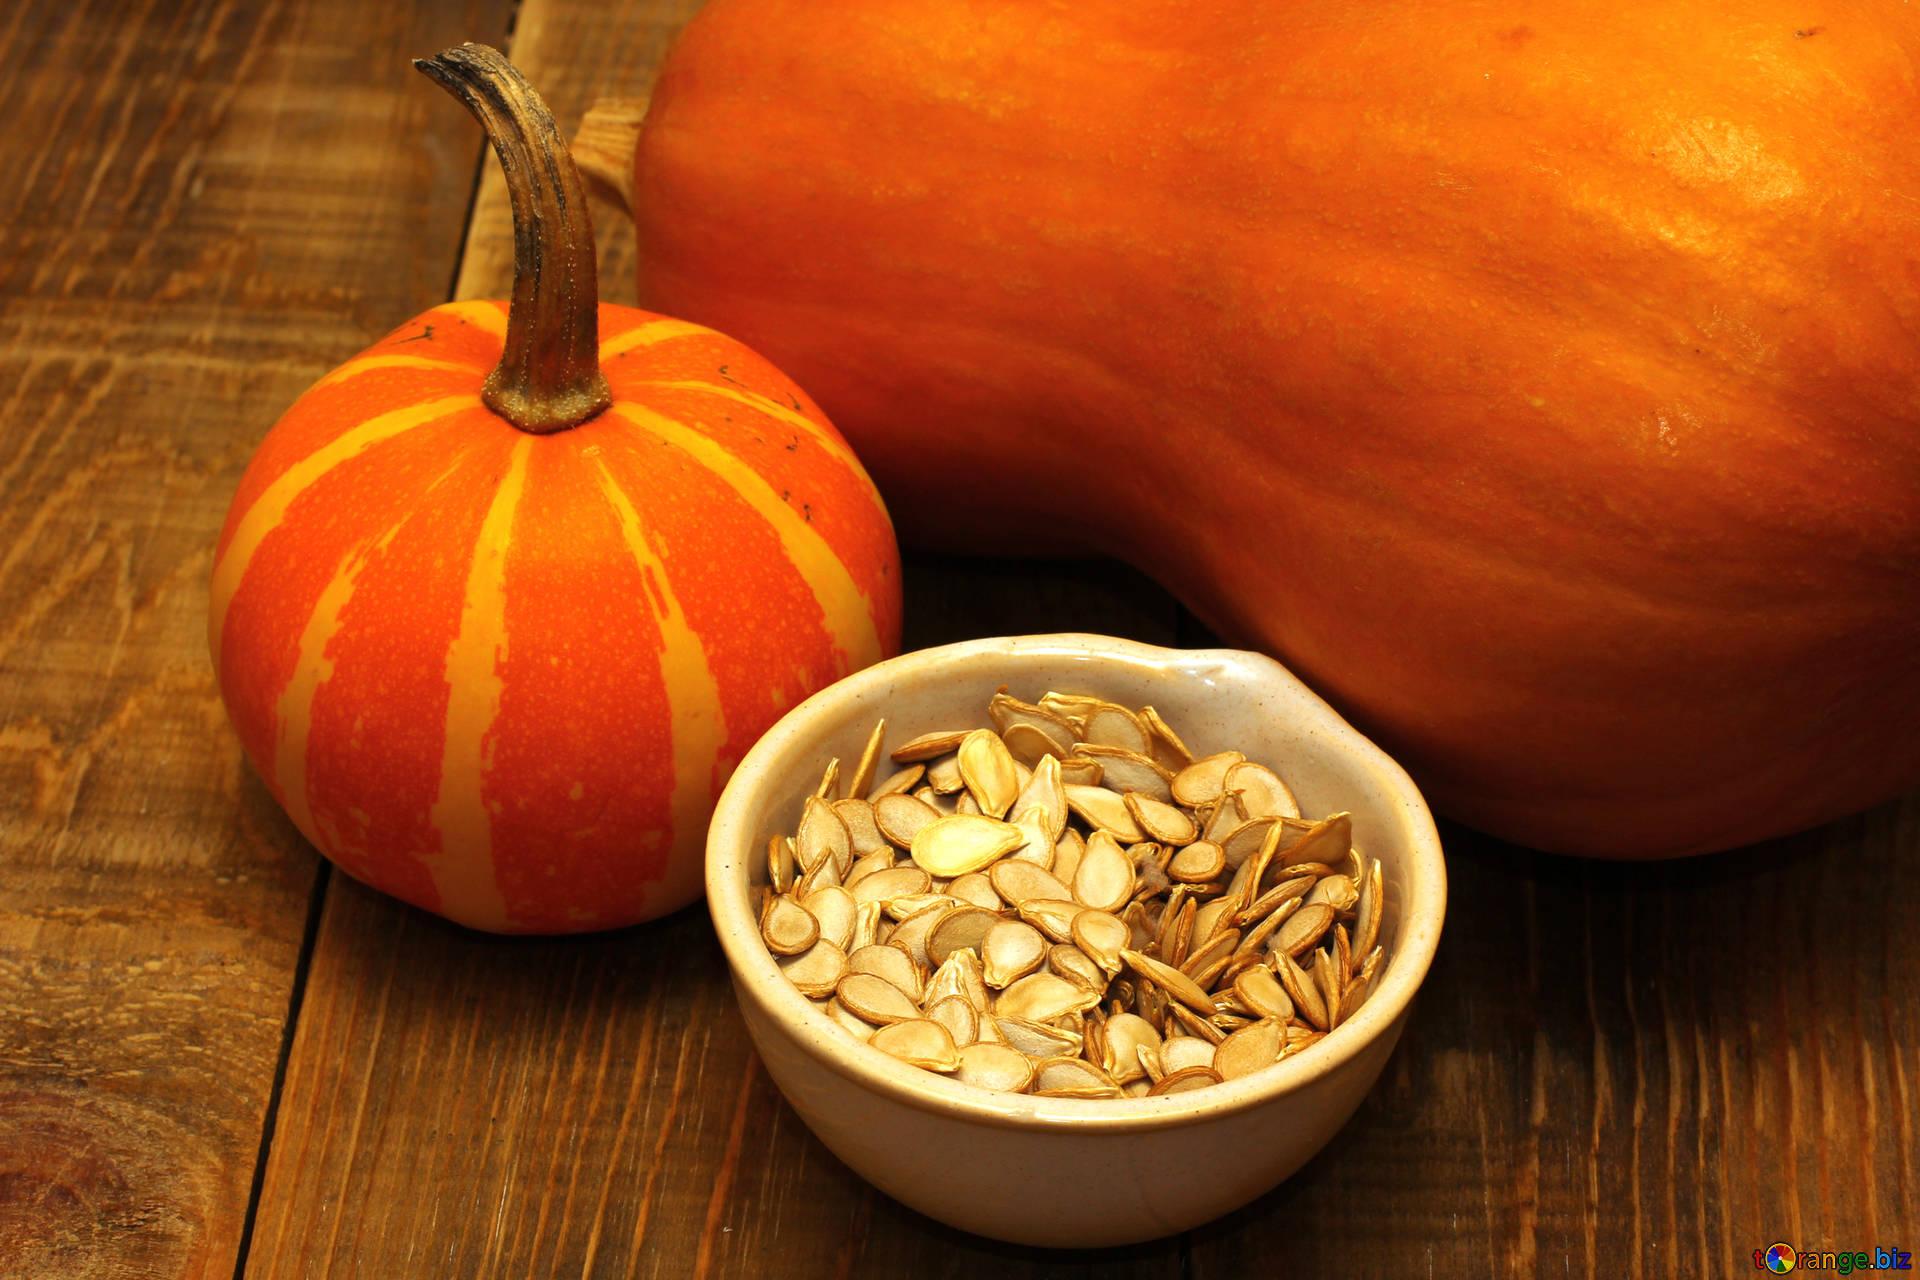 Free picture (Pumpkin Seeds) from https://torange.biz/pumpkin-seeds-35538